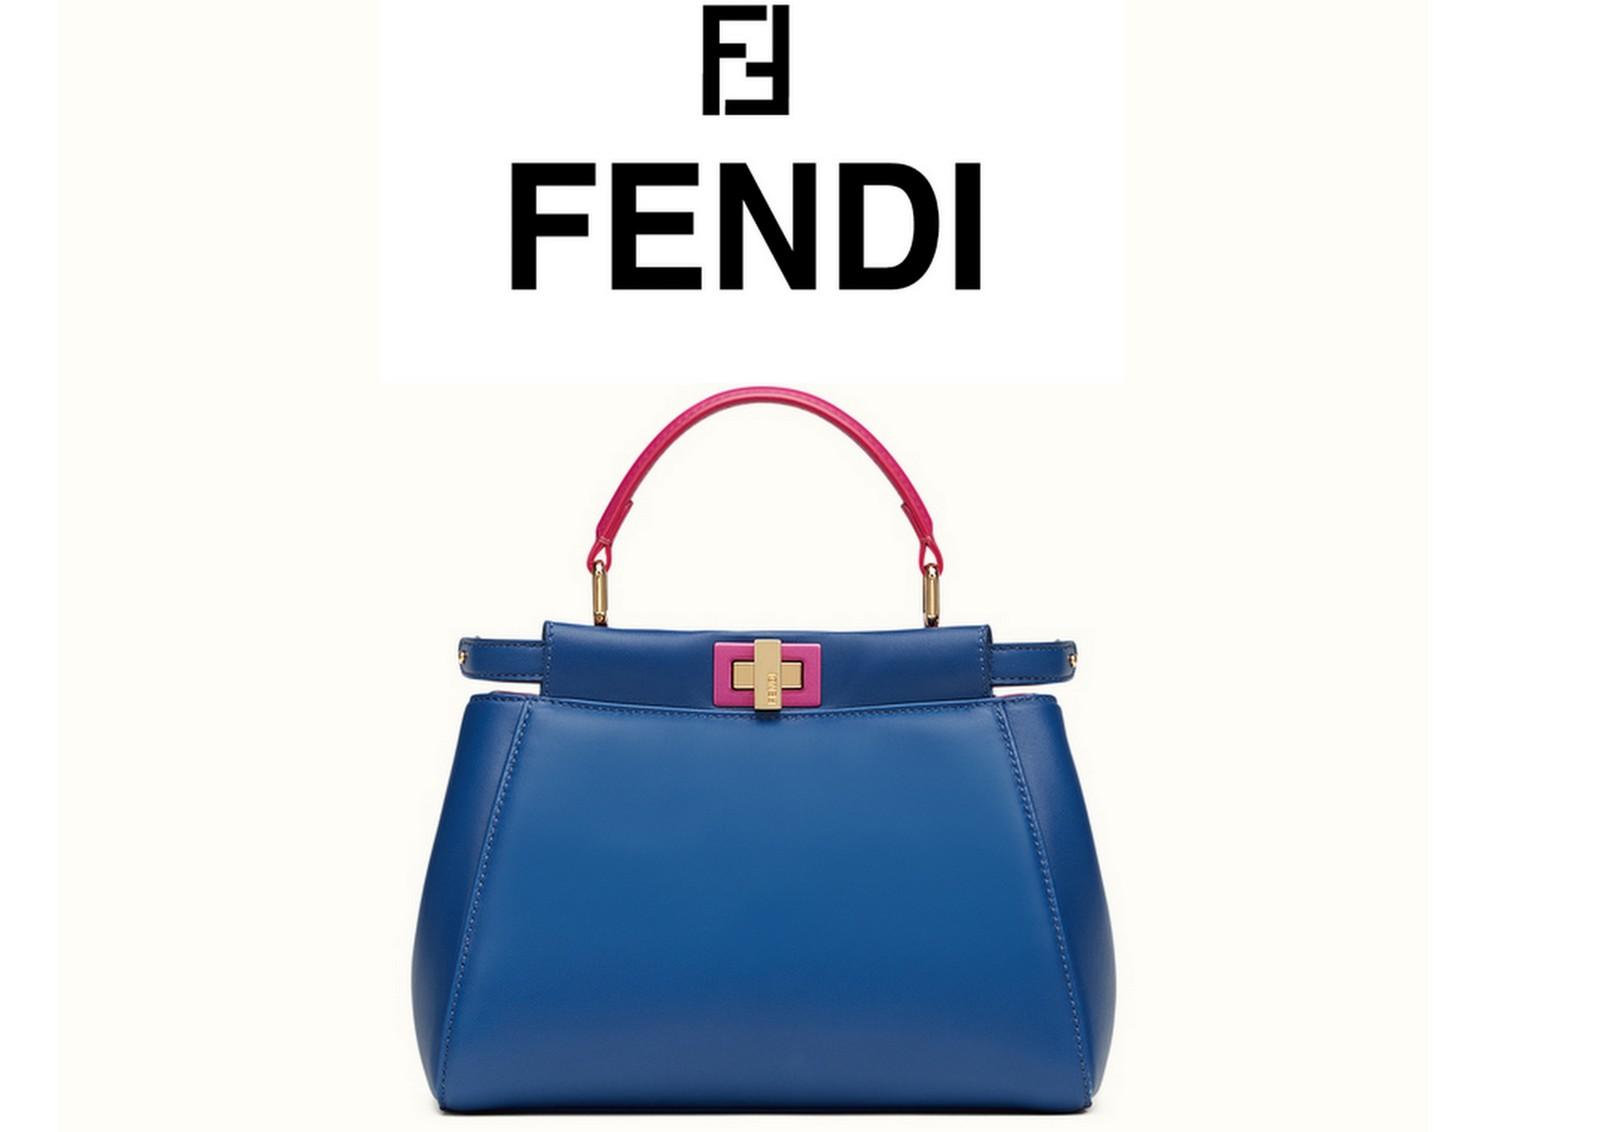 bags, trend, Fendi, dolce & gabbana, chloè, miu miu, gucci, louis vuitton, edie parker, delphine delafon, Culture & Trend Magazine, bags crush